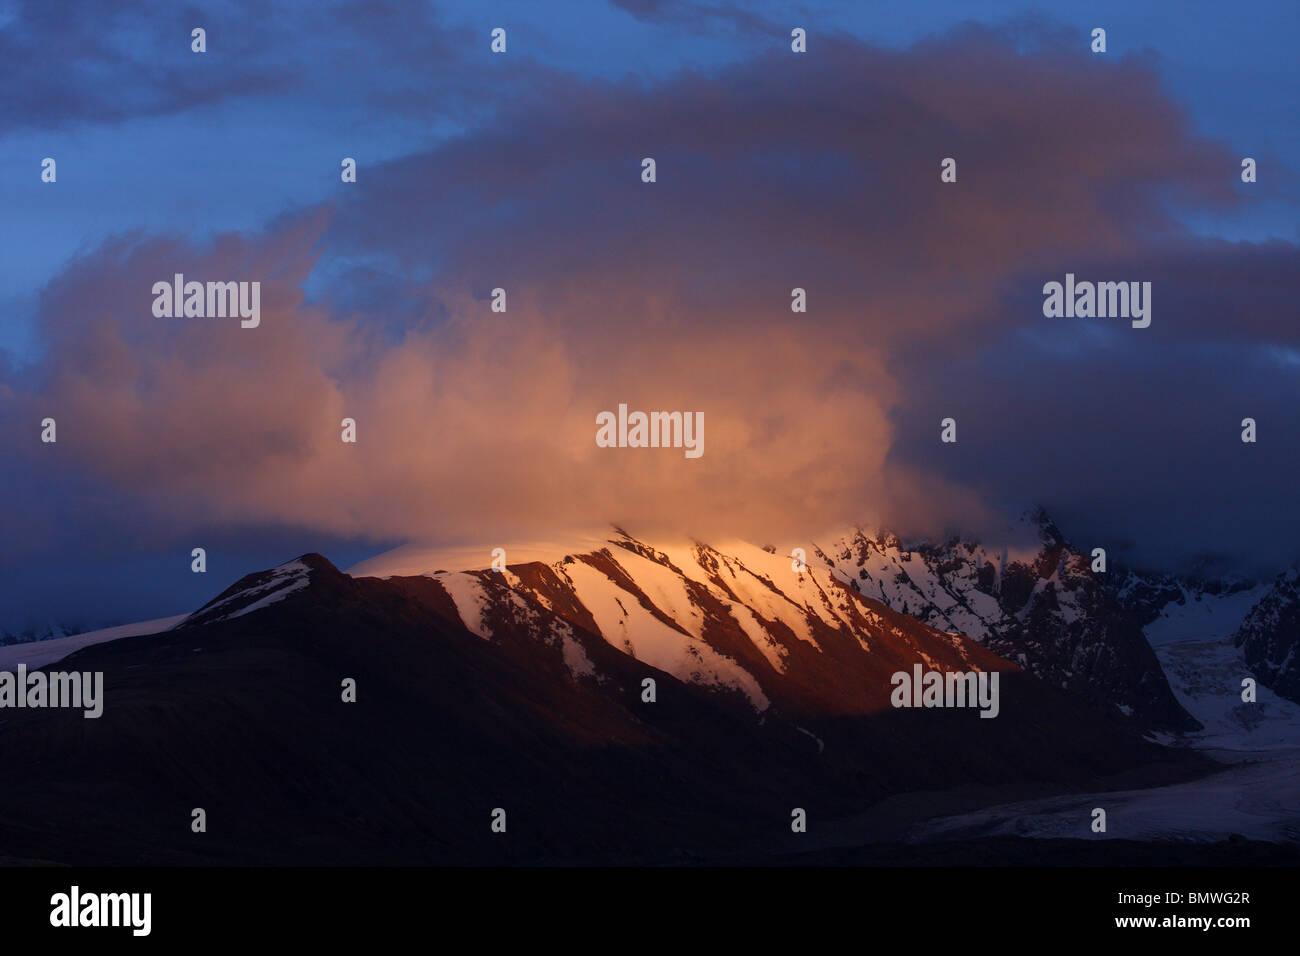 Tien Shan Mountains, Kyrgystan - Stock Image